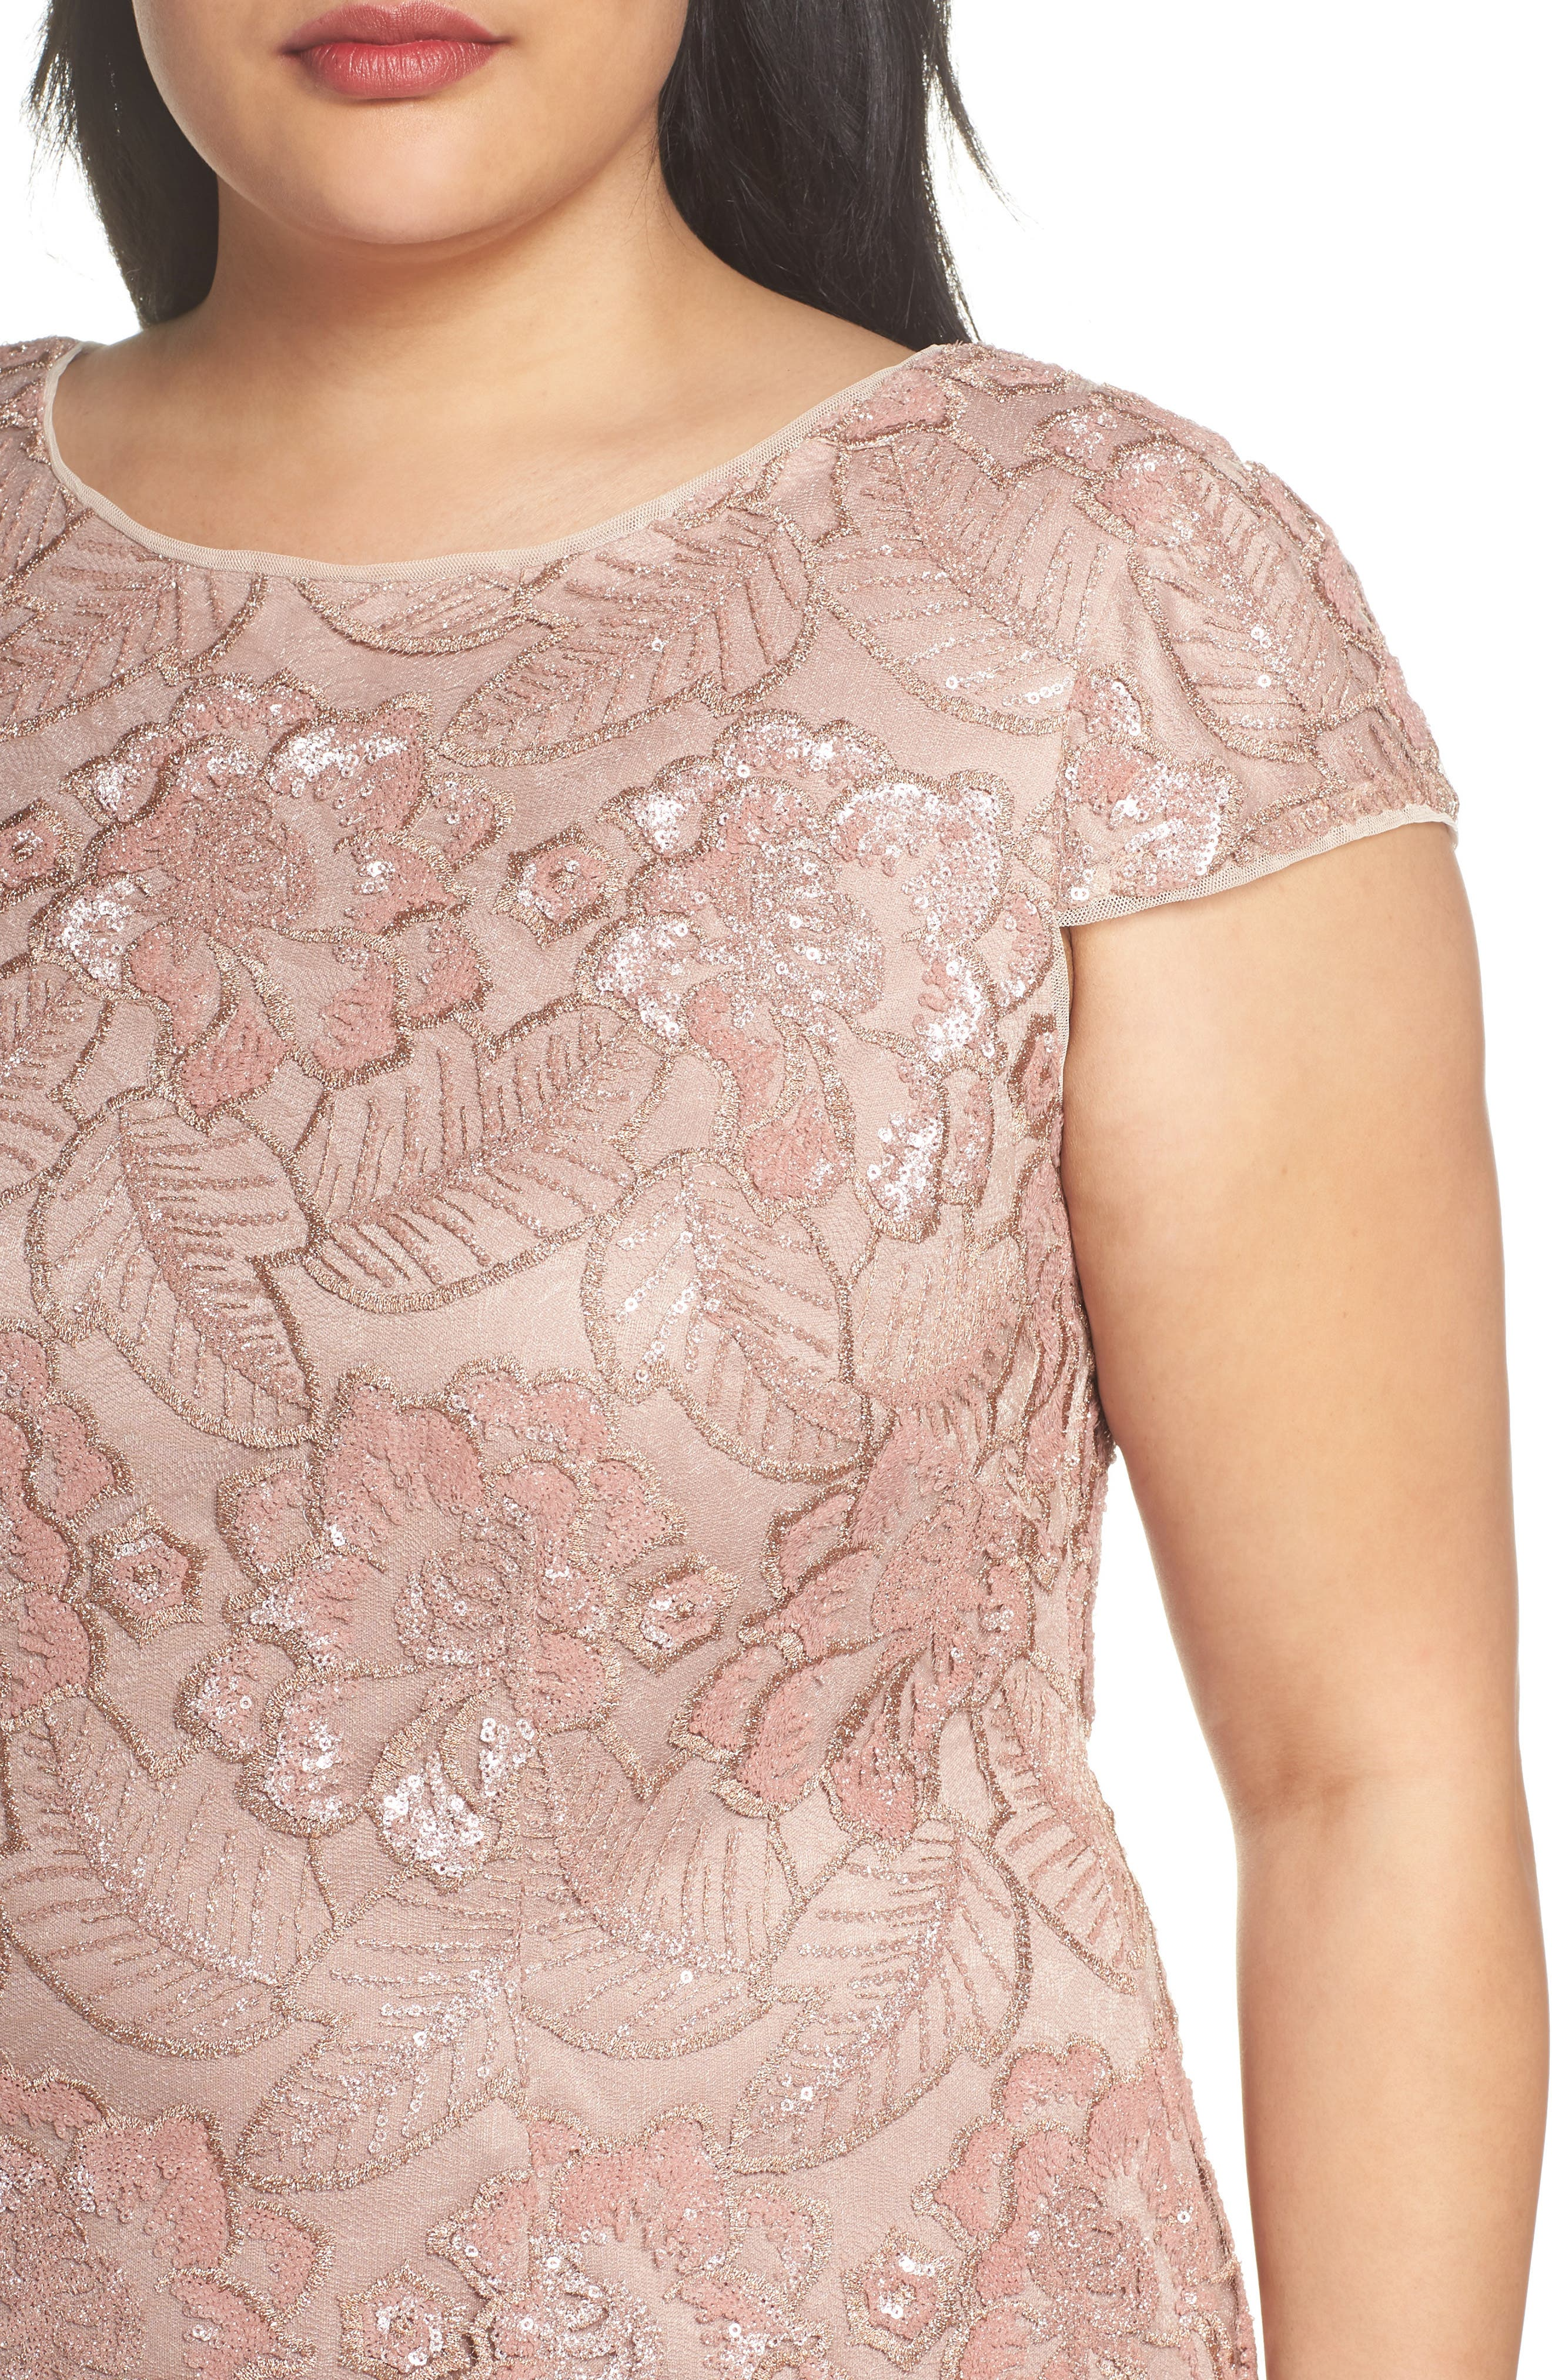 Sequin Lace Cocktail Dress,                             Alternate thumbnail 4, color,                             ROSE GOLD